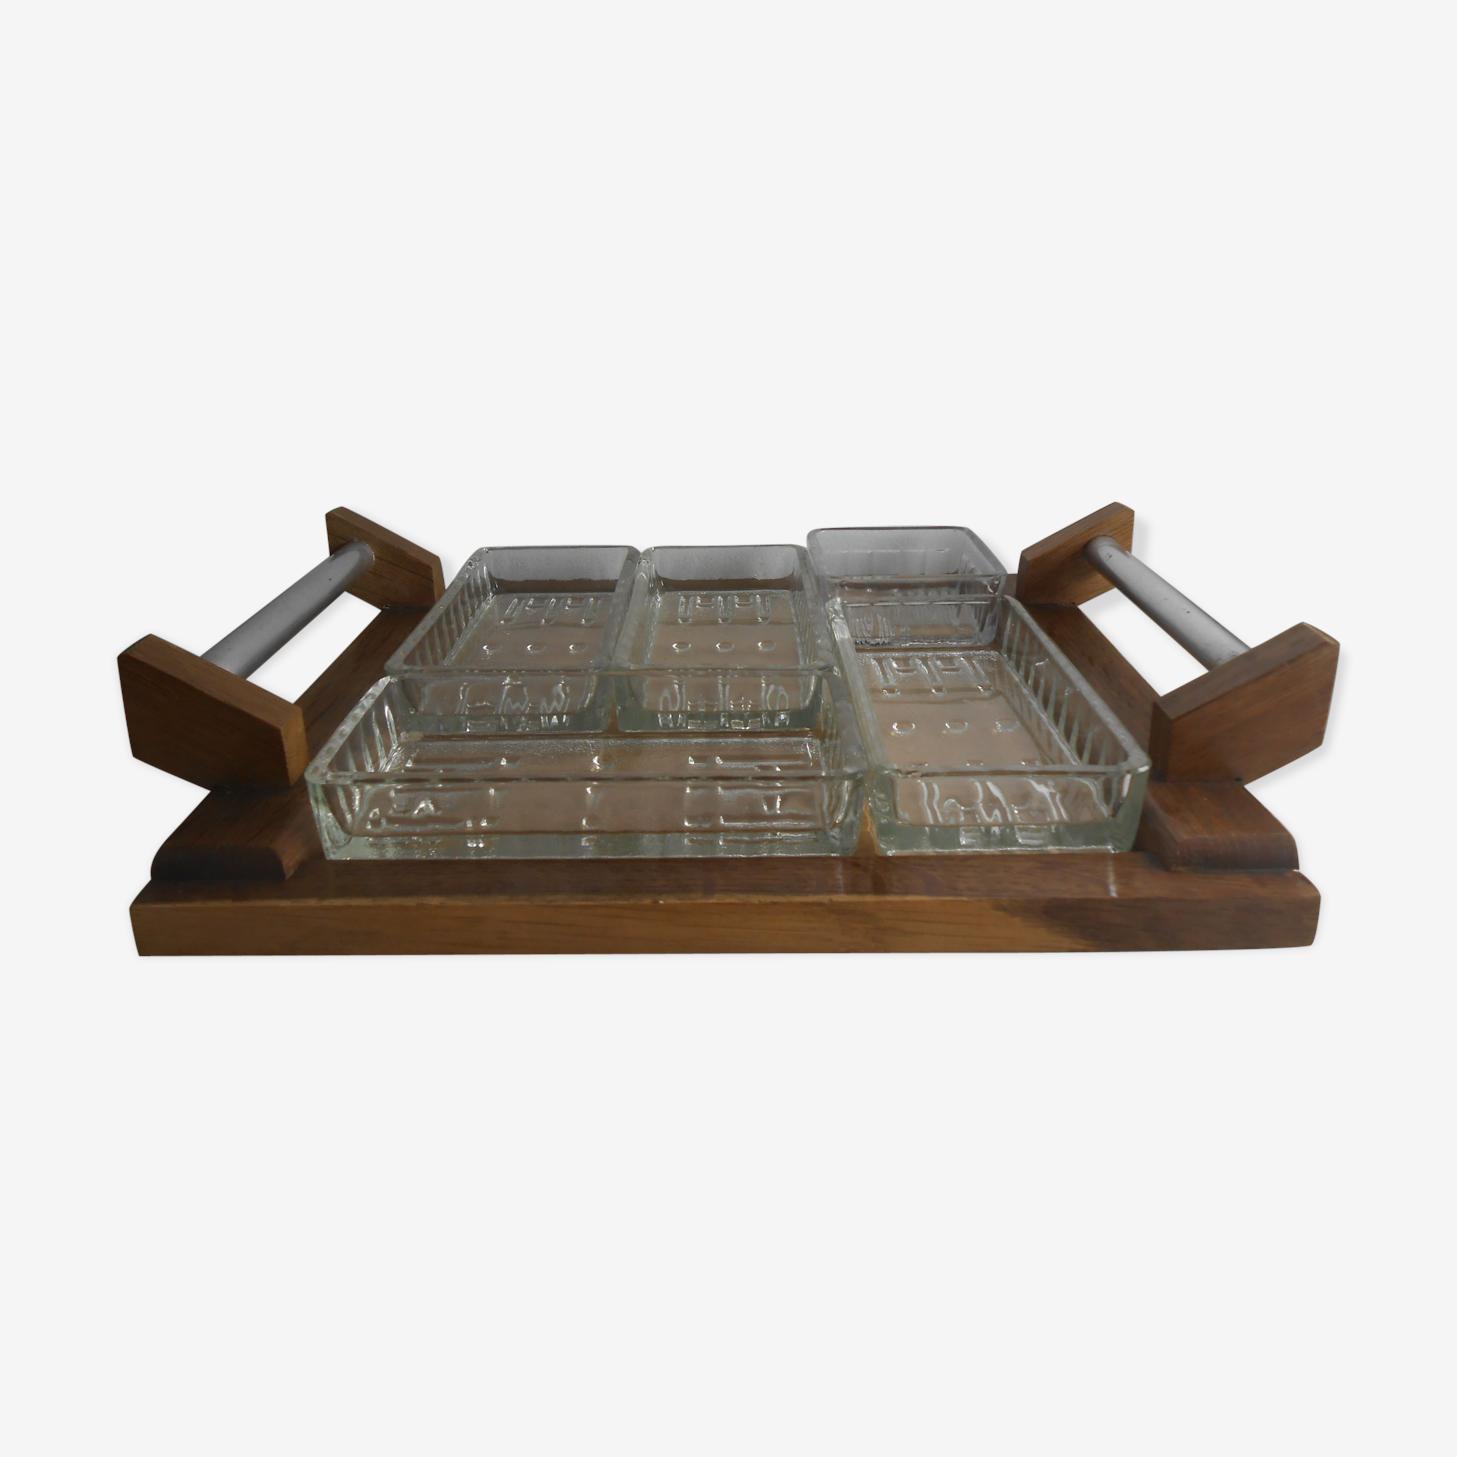 Vintage appetizer tray